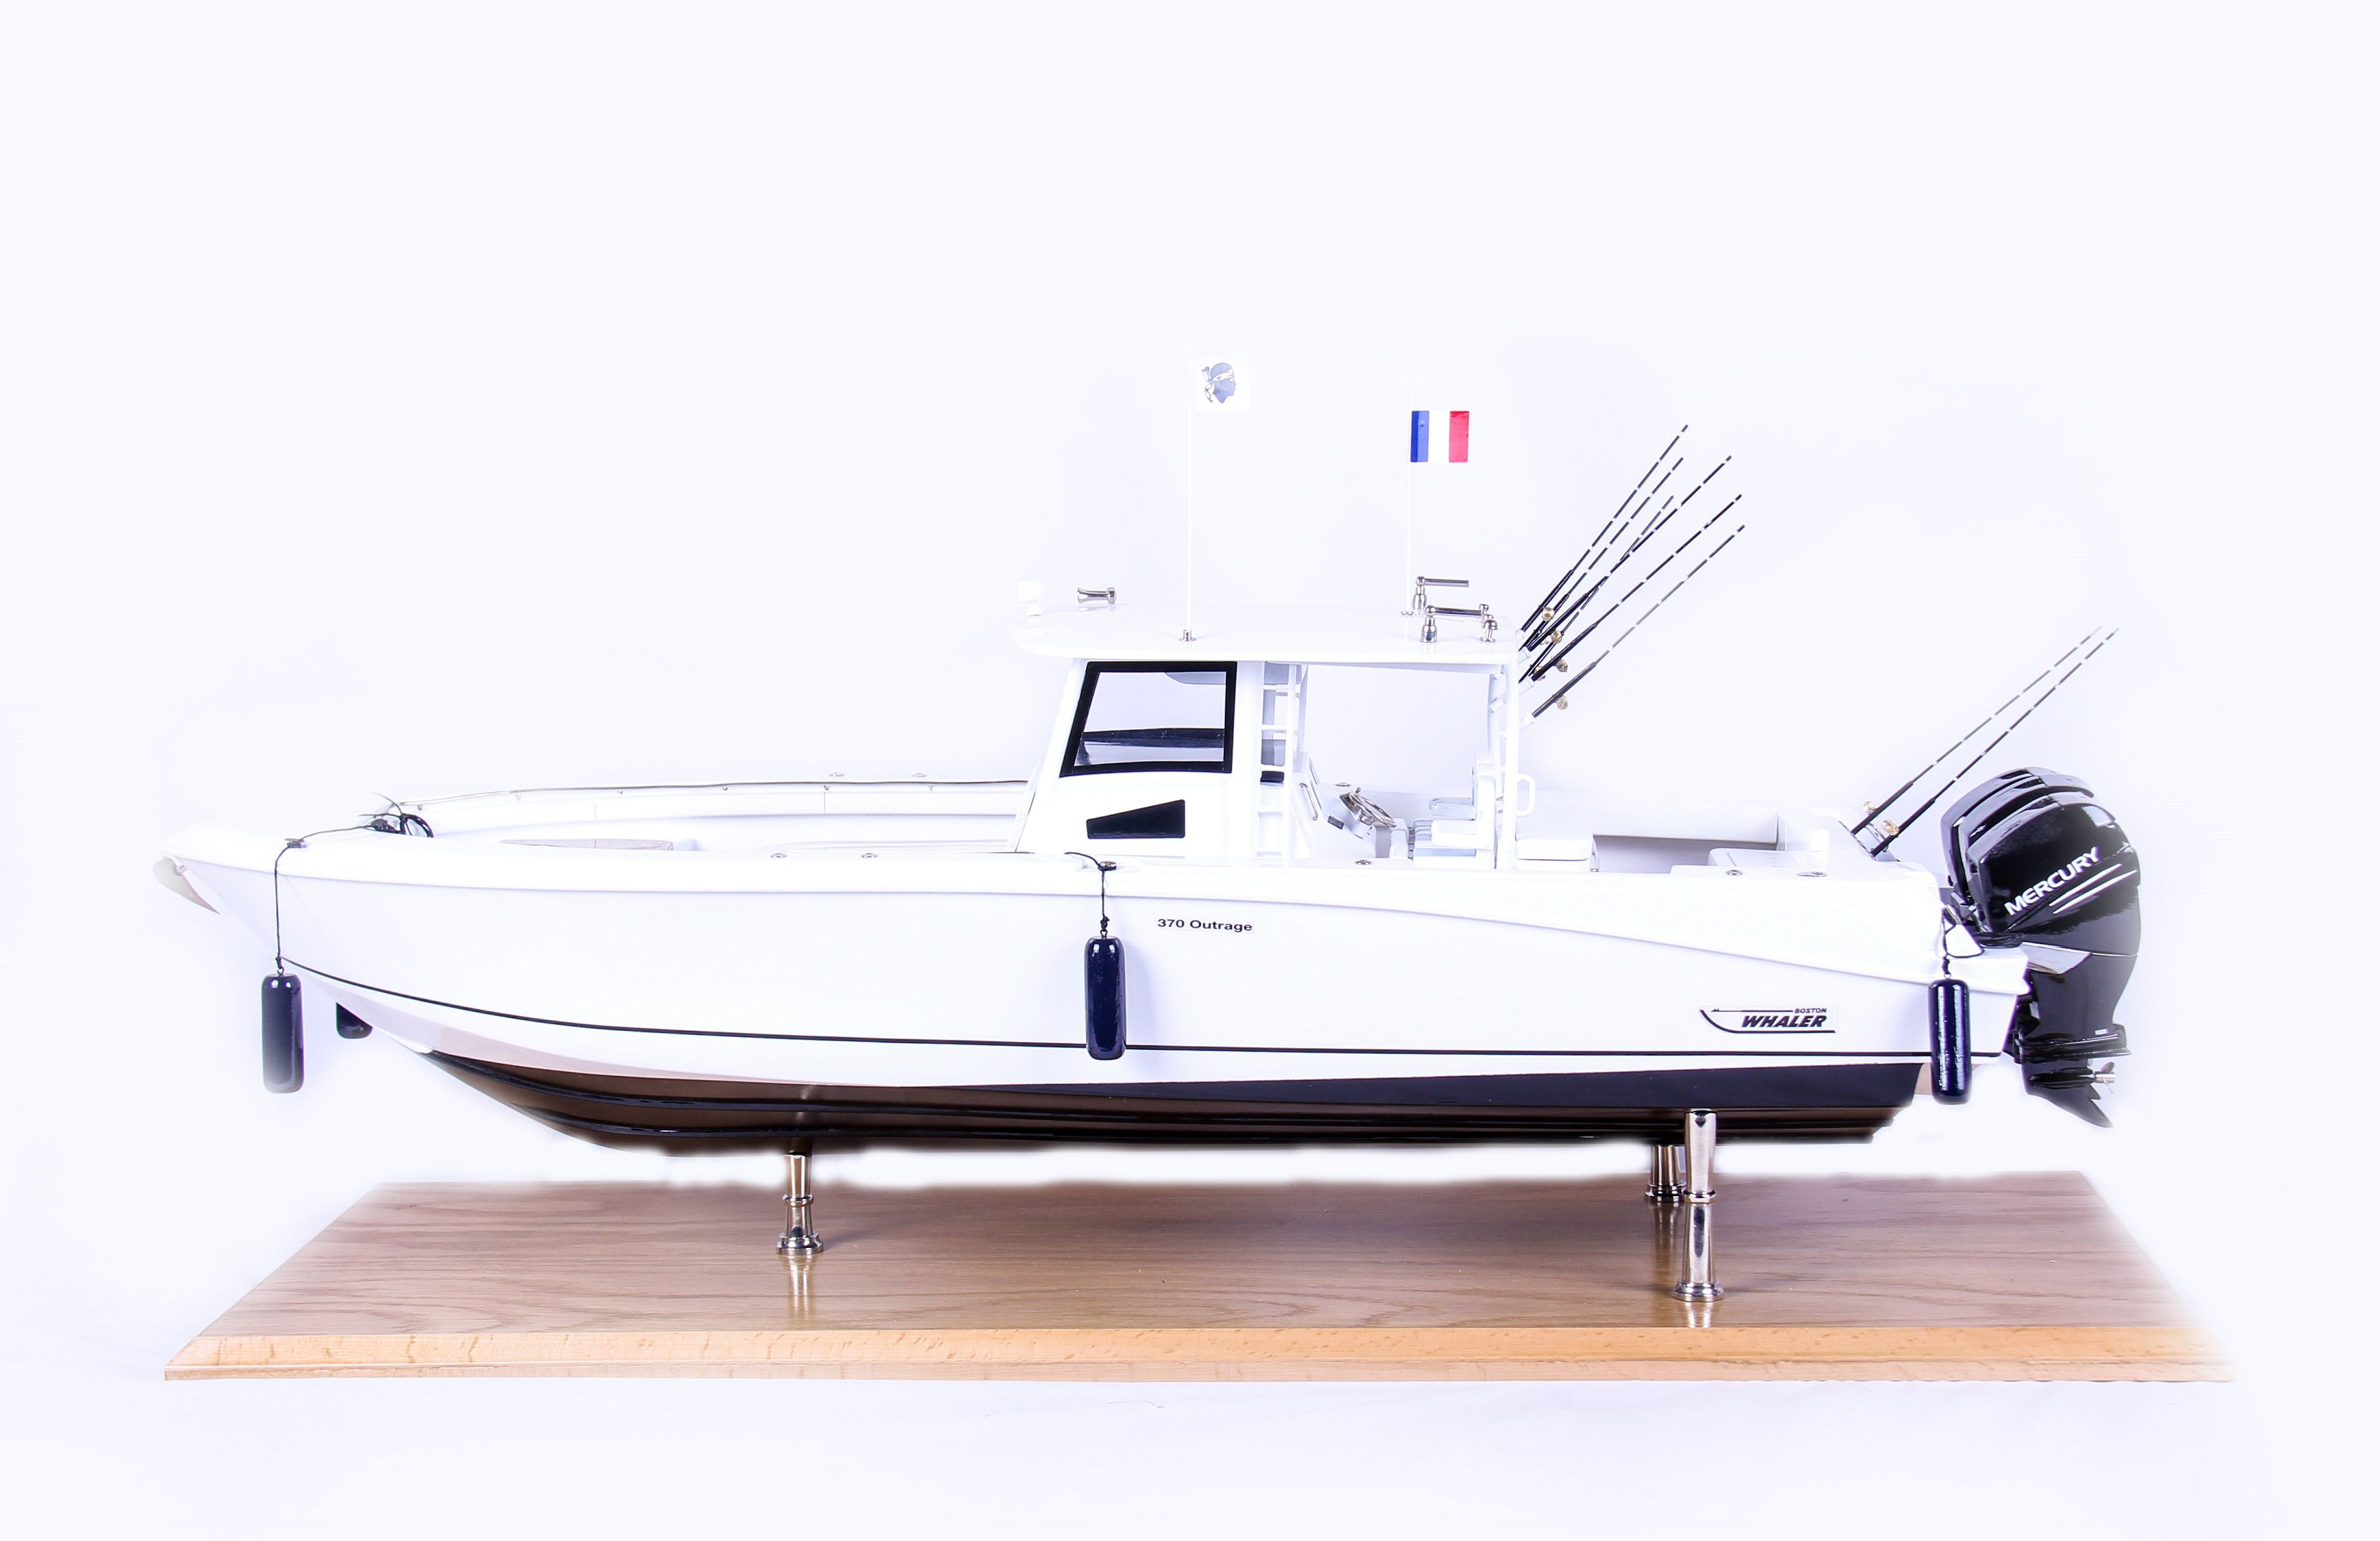 1686-9515-Boston-Whaler-Outrage-370-Model-Boat